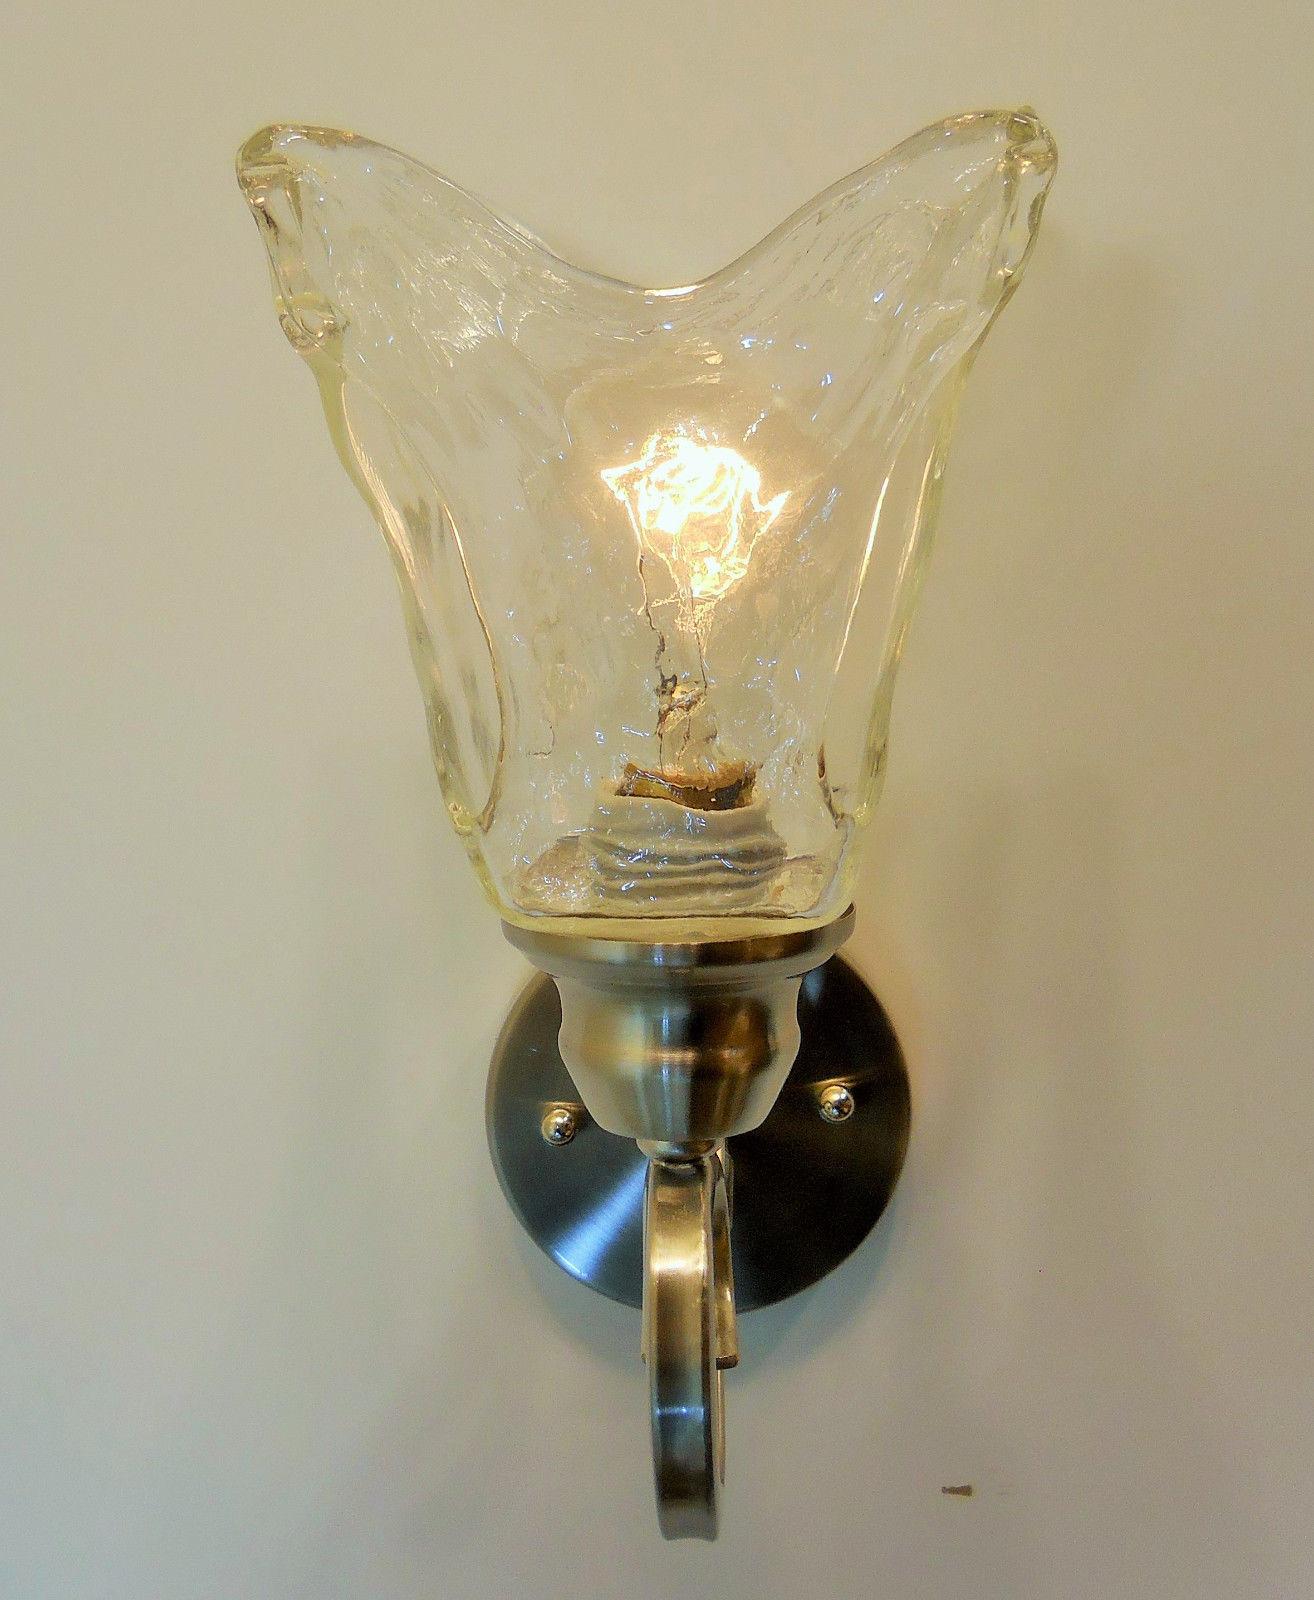 Handmade Glass Vintage Edison Bulb Type Wall Sconce Light Fixture